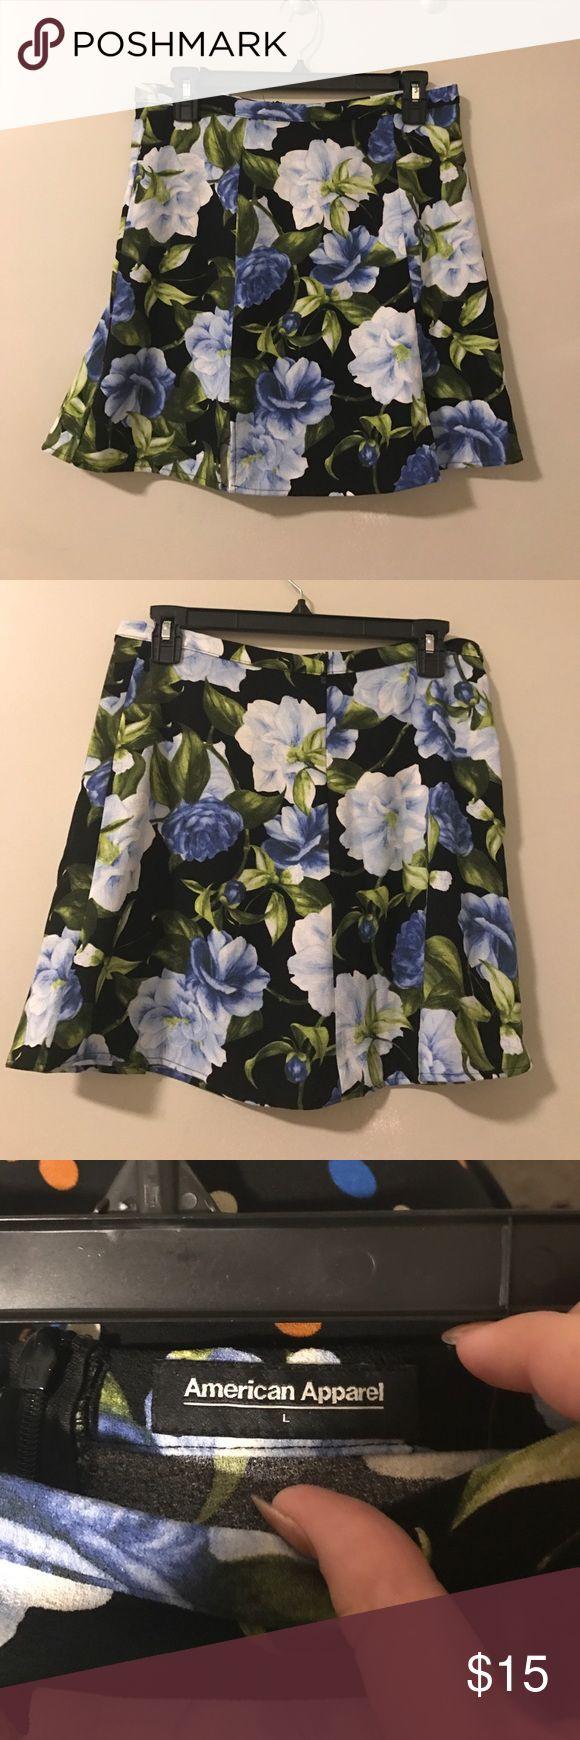 American apparel skater skirt A floral printed American apparel skirt American Apparel Skirts Mini